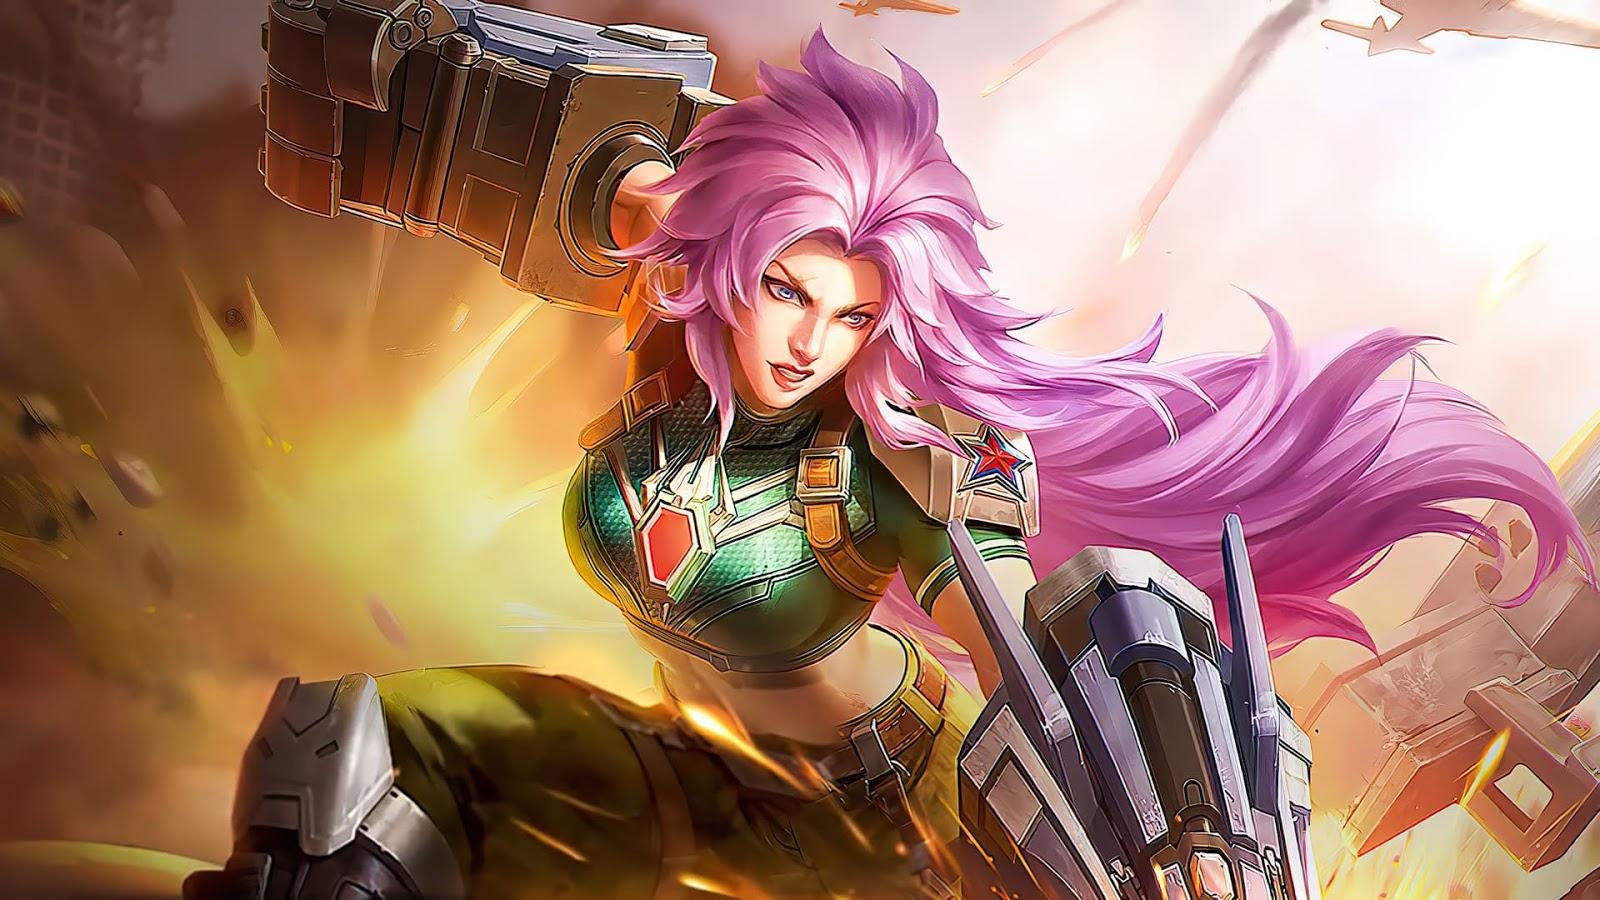 Wallpaper Masha Combat Maiden Skin Mobile Legends HD for PC